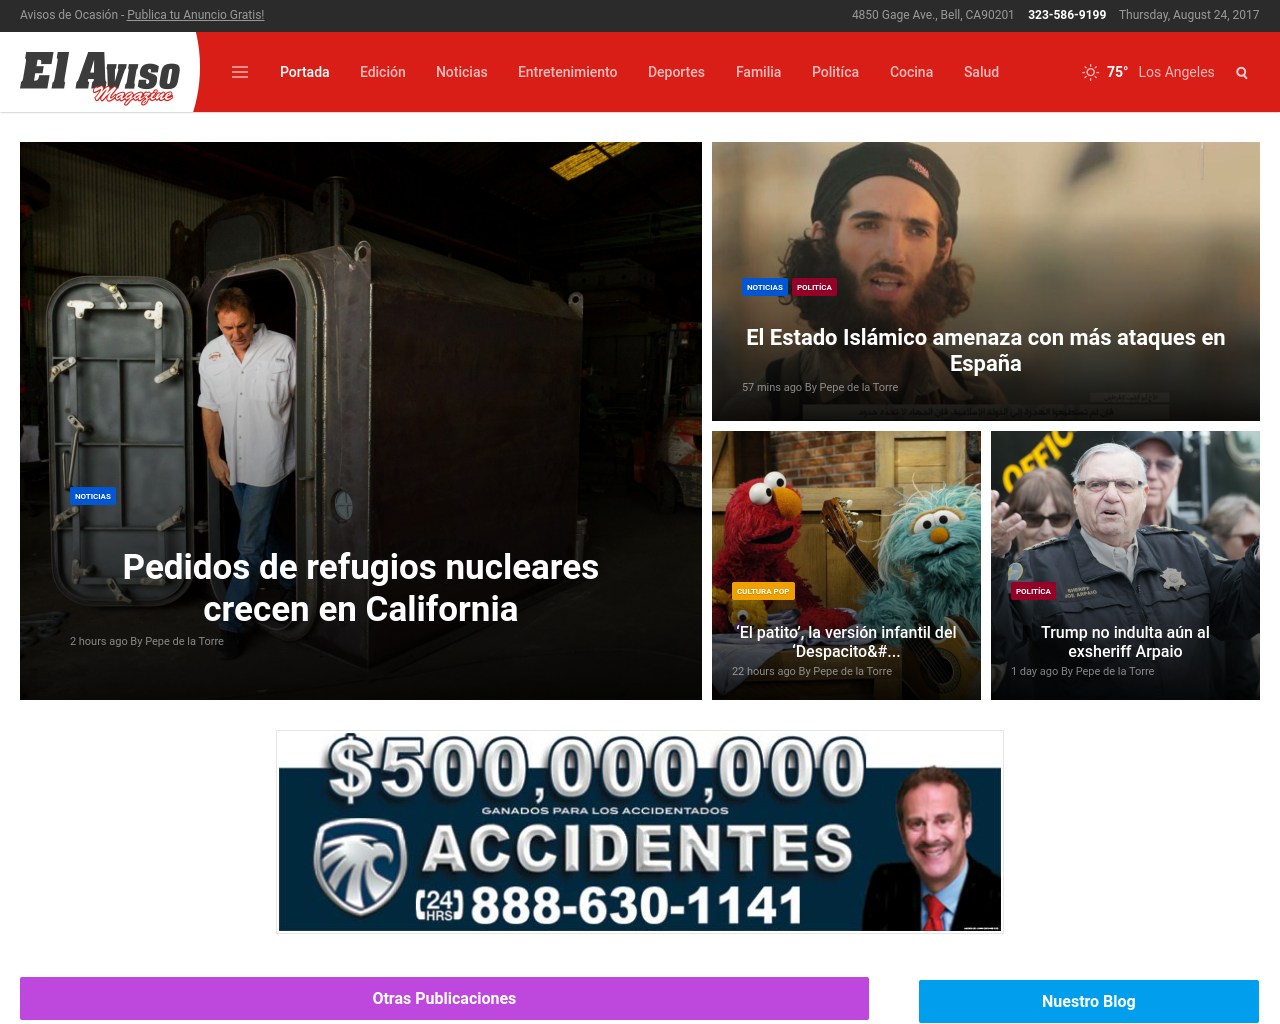 El-Aviso-Magazine-Advertising-Reviews-Pricing